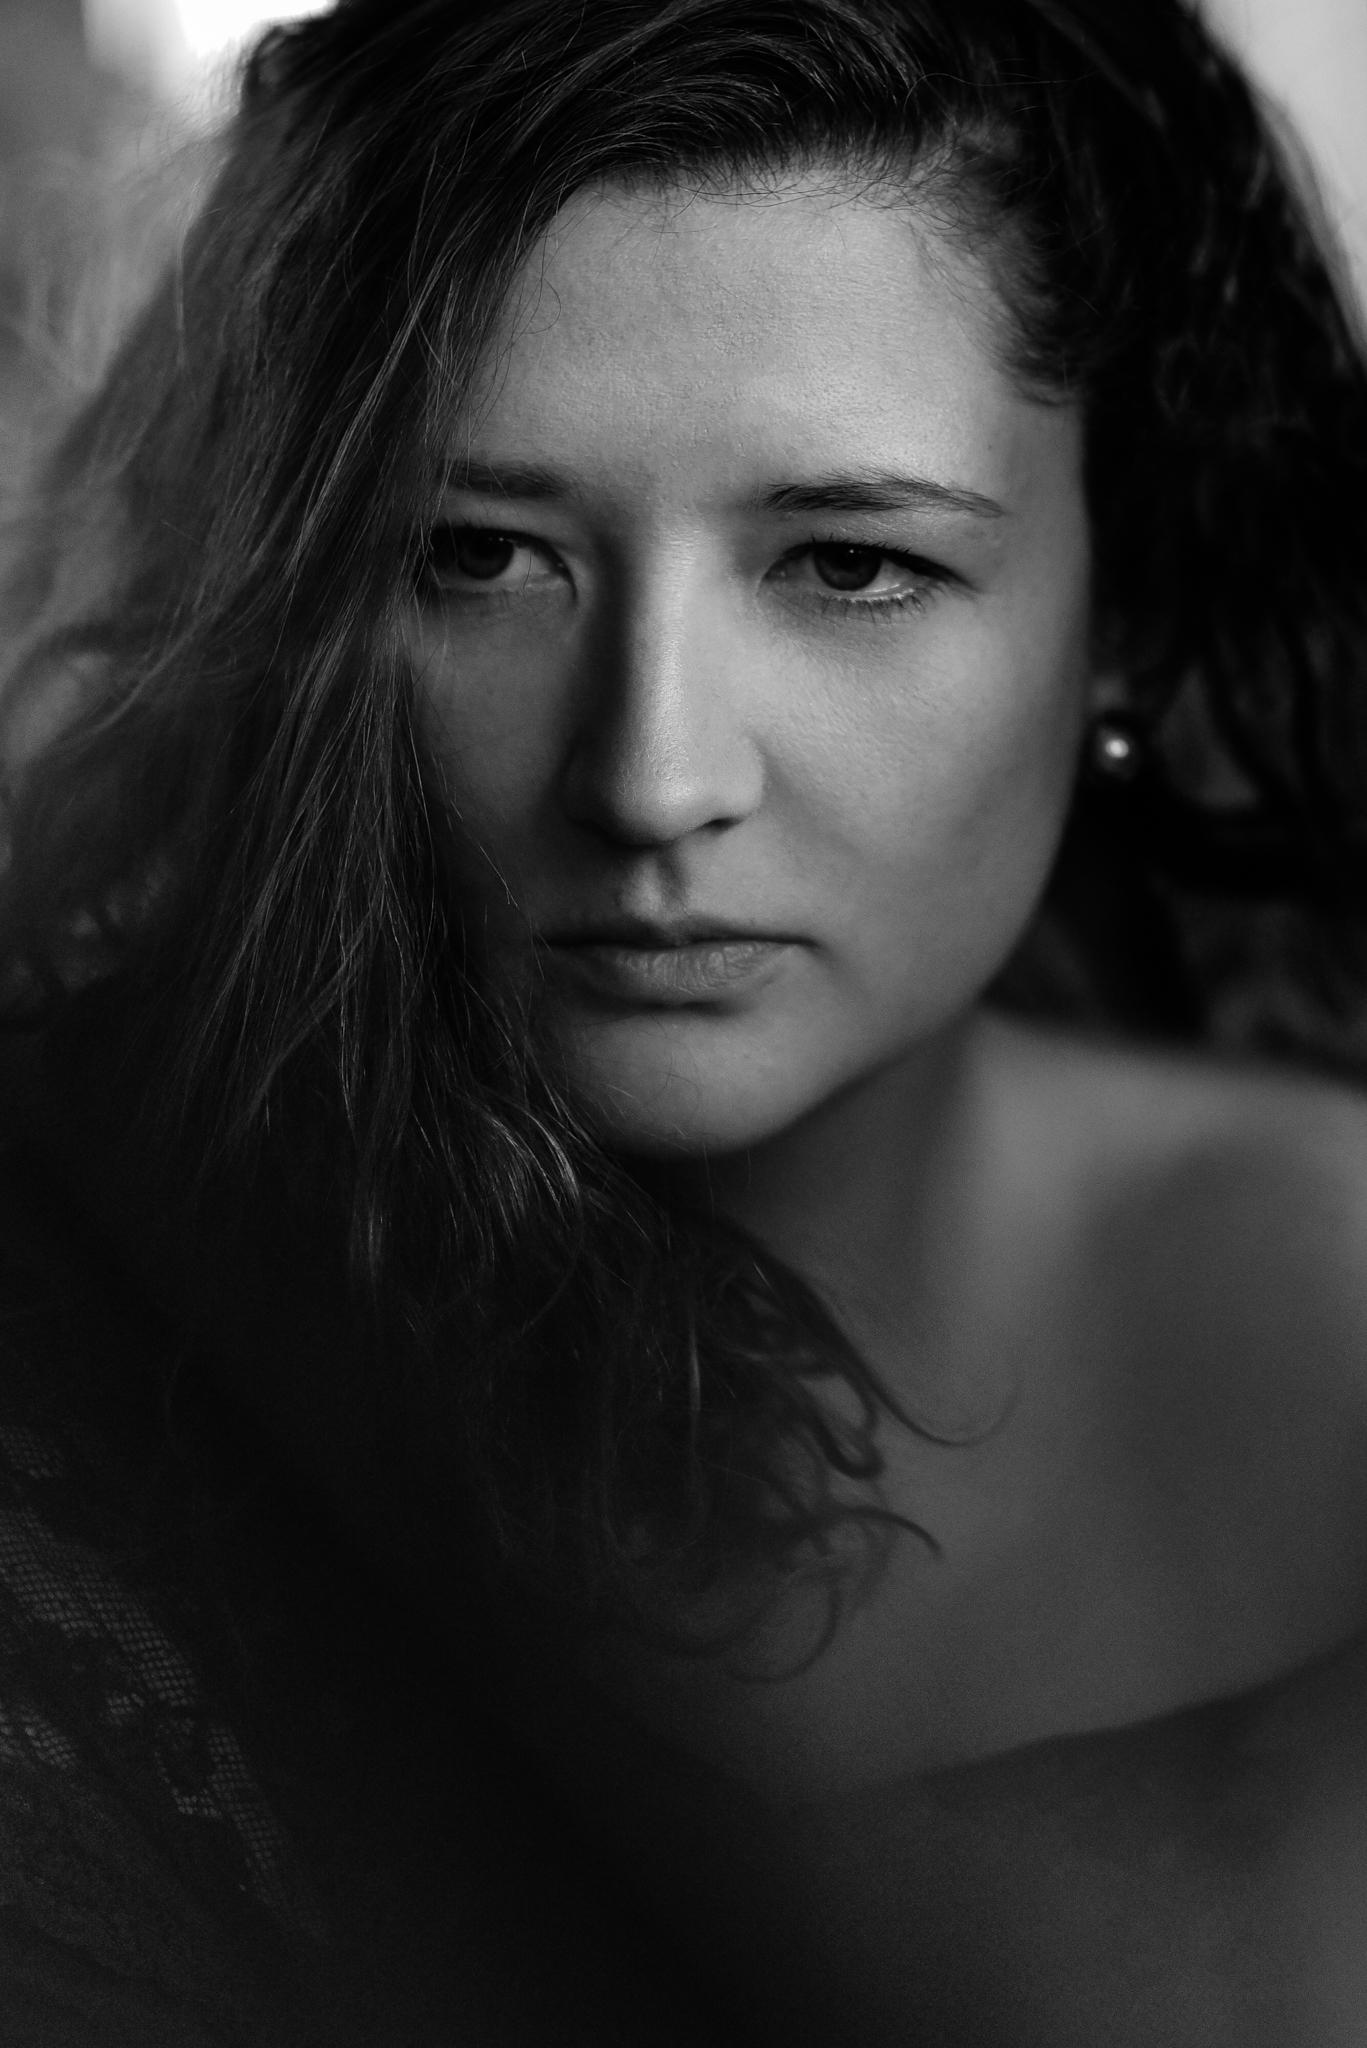 Fotograf | Andreas Wohlers Fotografie